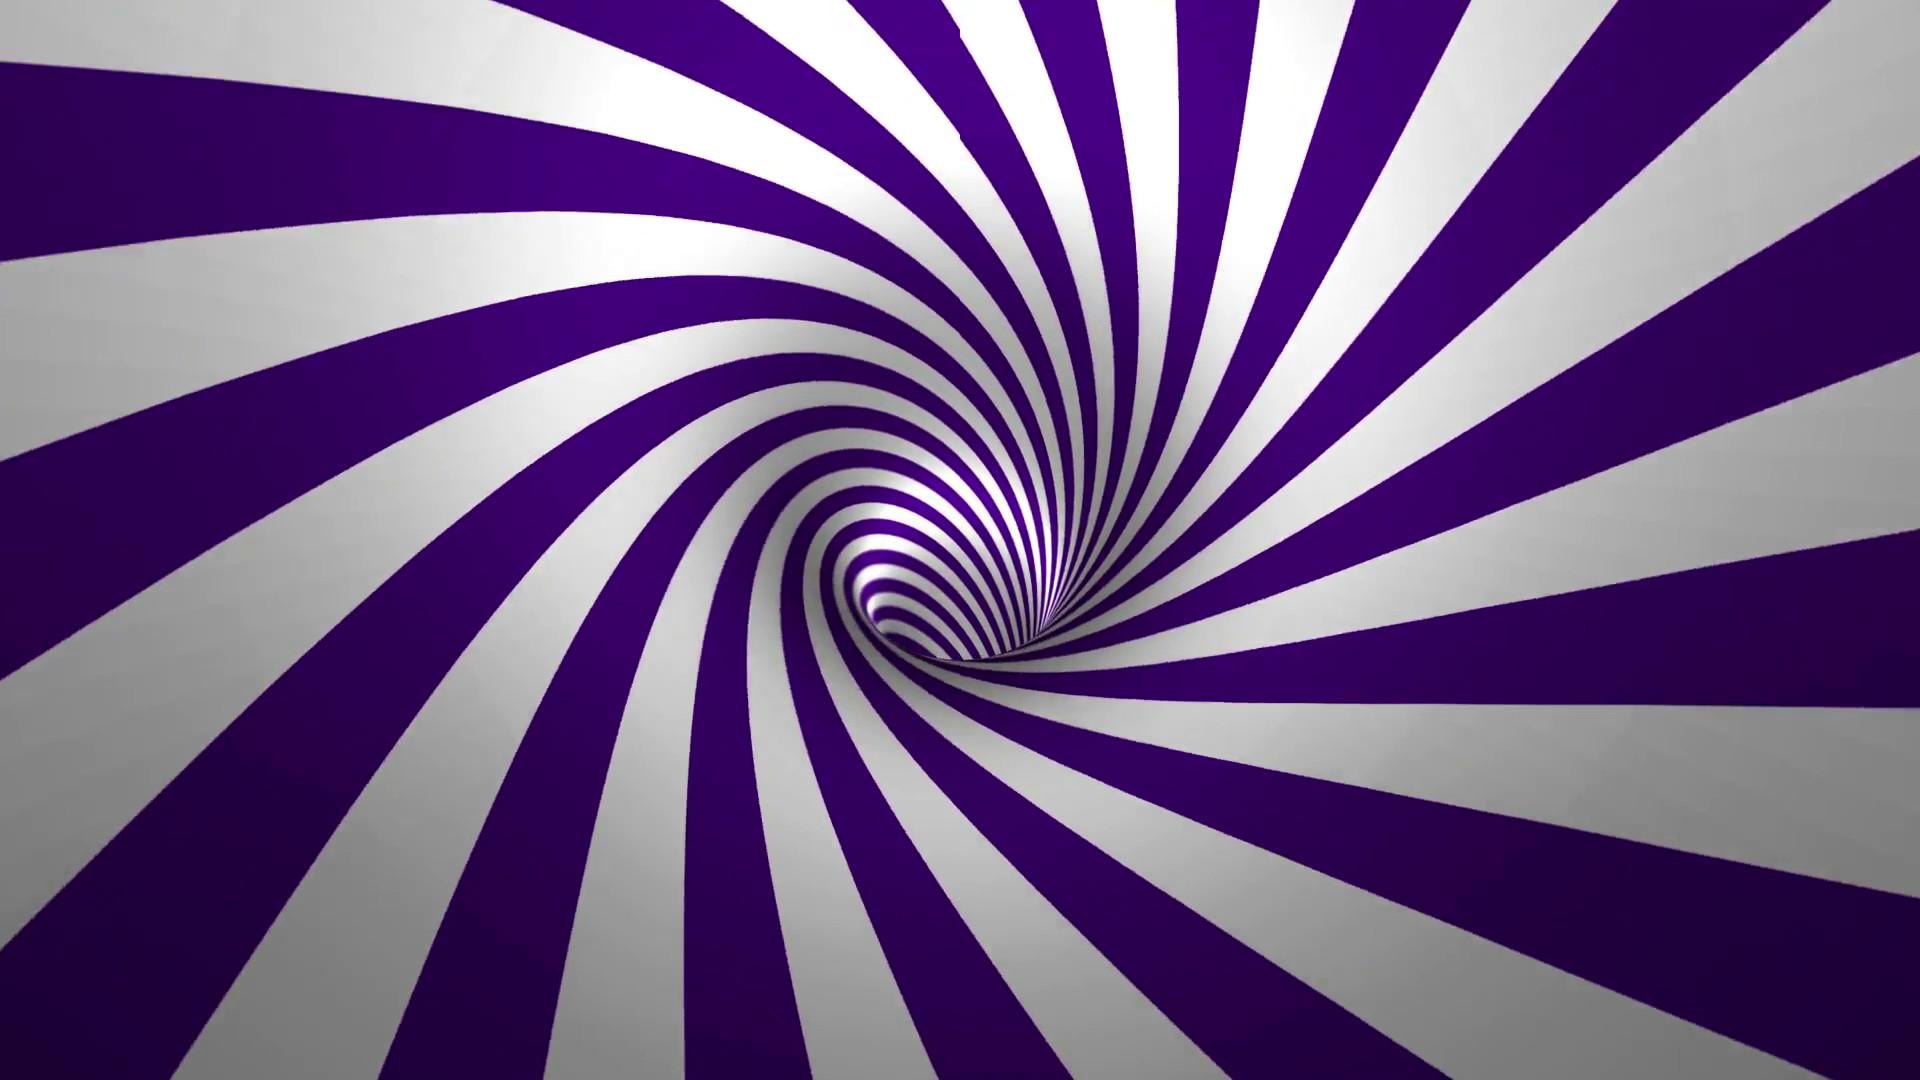 Hypnotic spiral , purple and white background in 3D Motion Background –  VideoBlocks